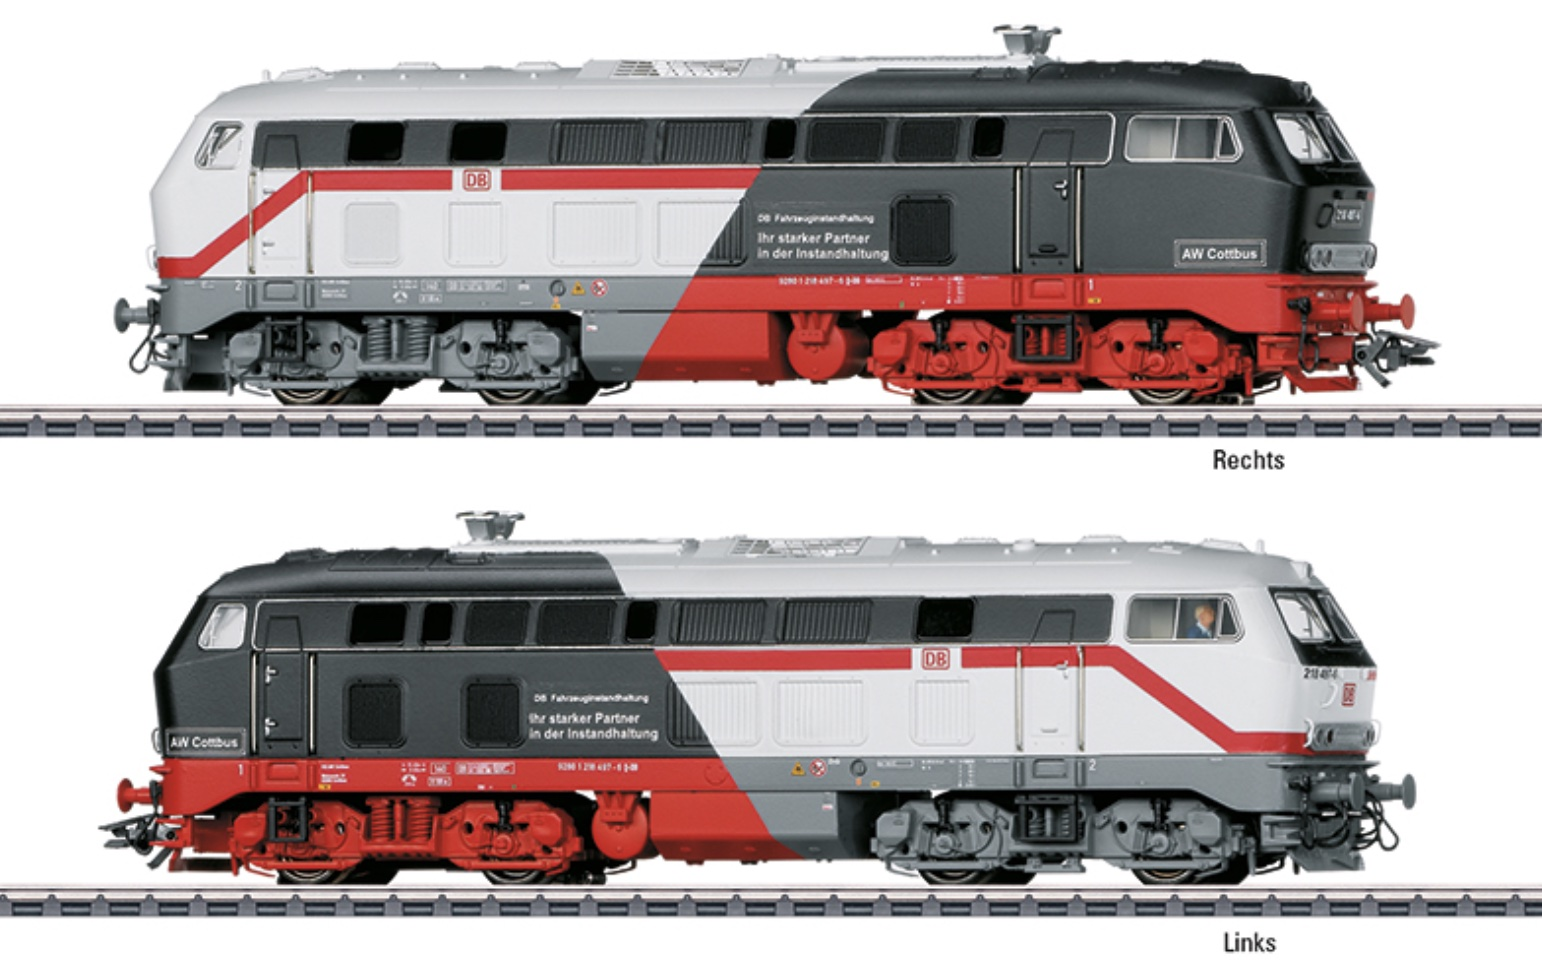 Marklin/MiniTrix Special HO/N/Z BR218 'Cottbus Maintenance' Locomotive